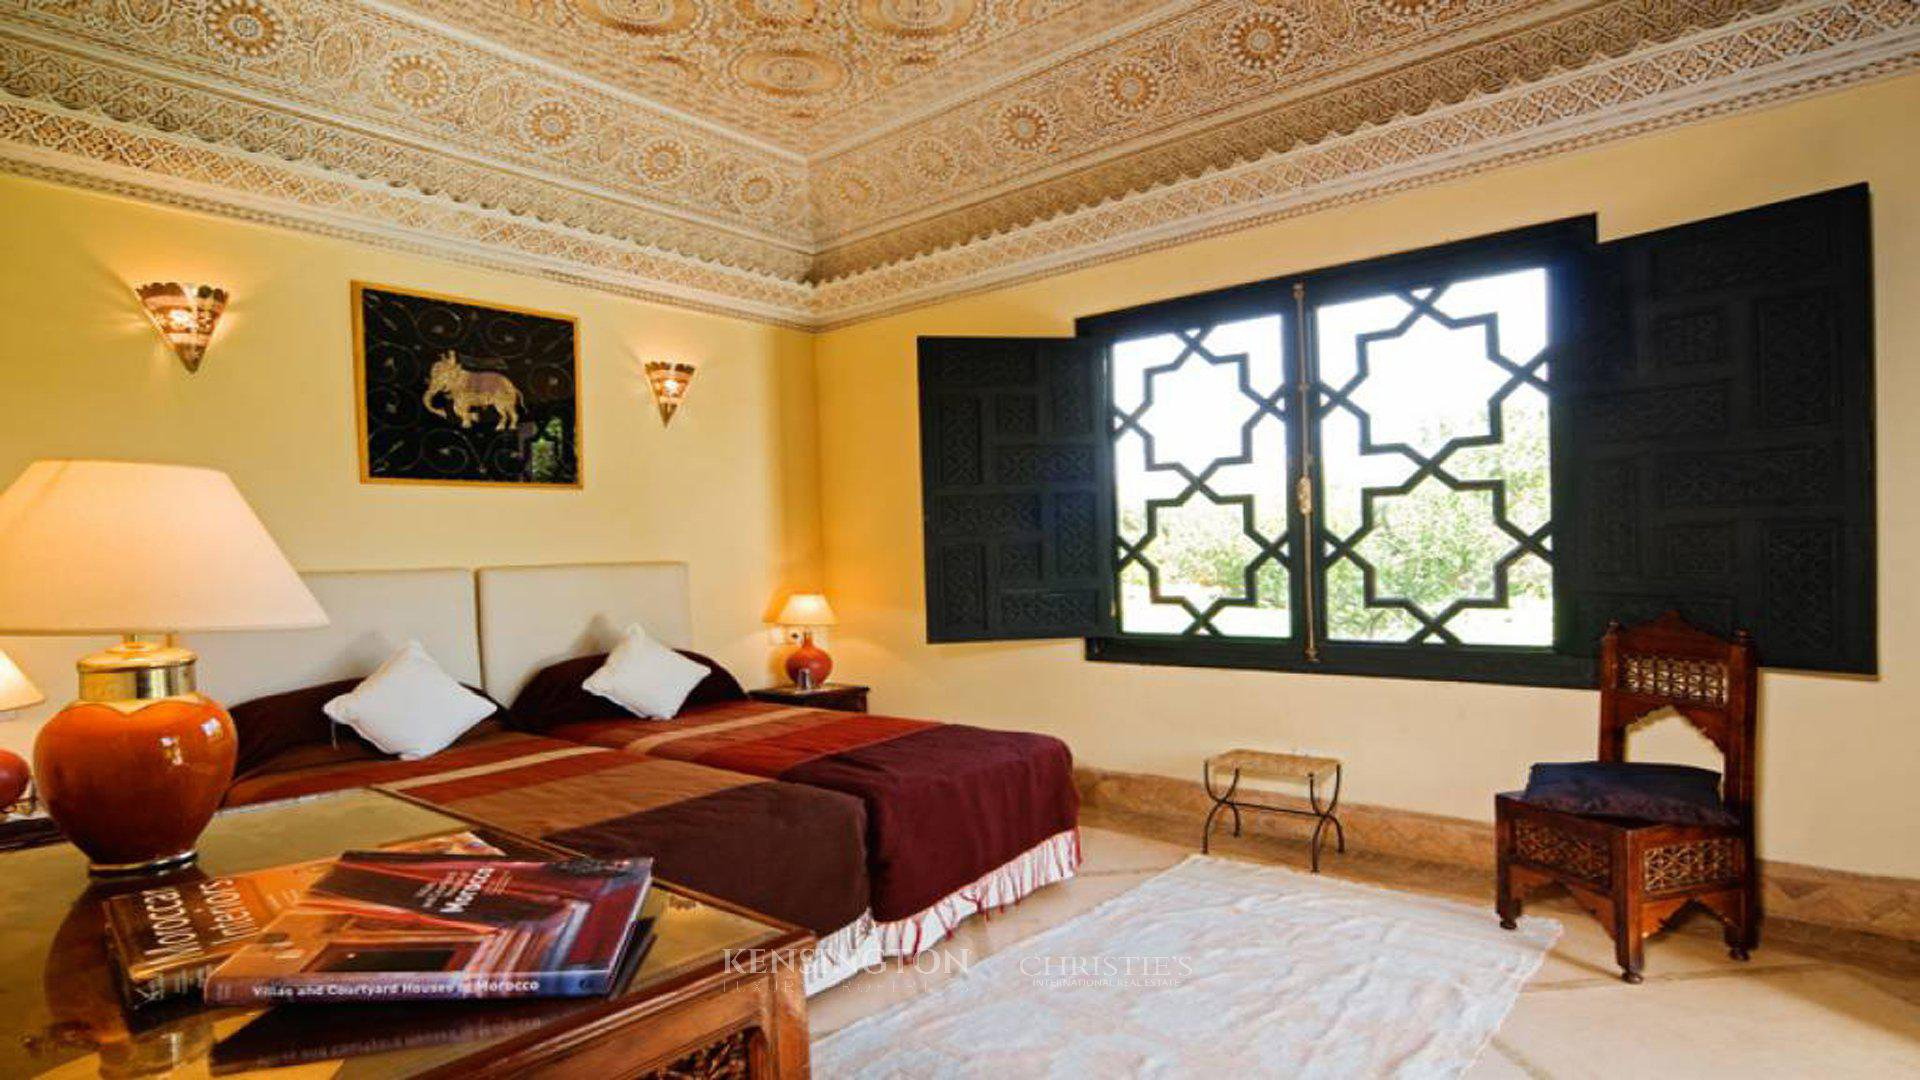 KPPM00516: Villa Rabia Luxury Villa Marrakech Morocco